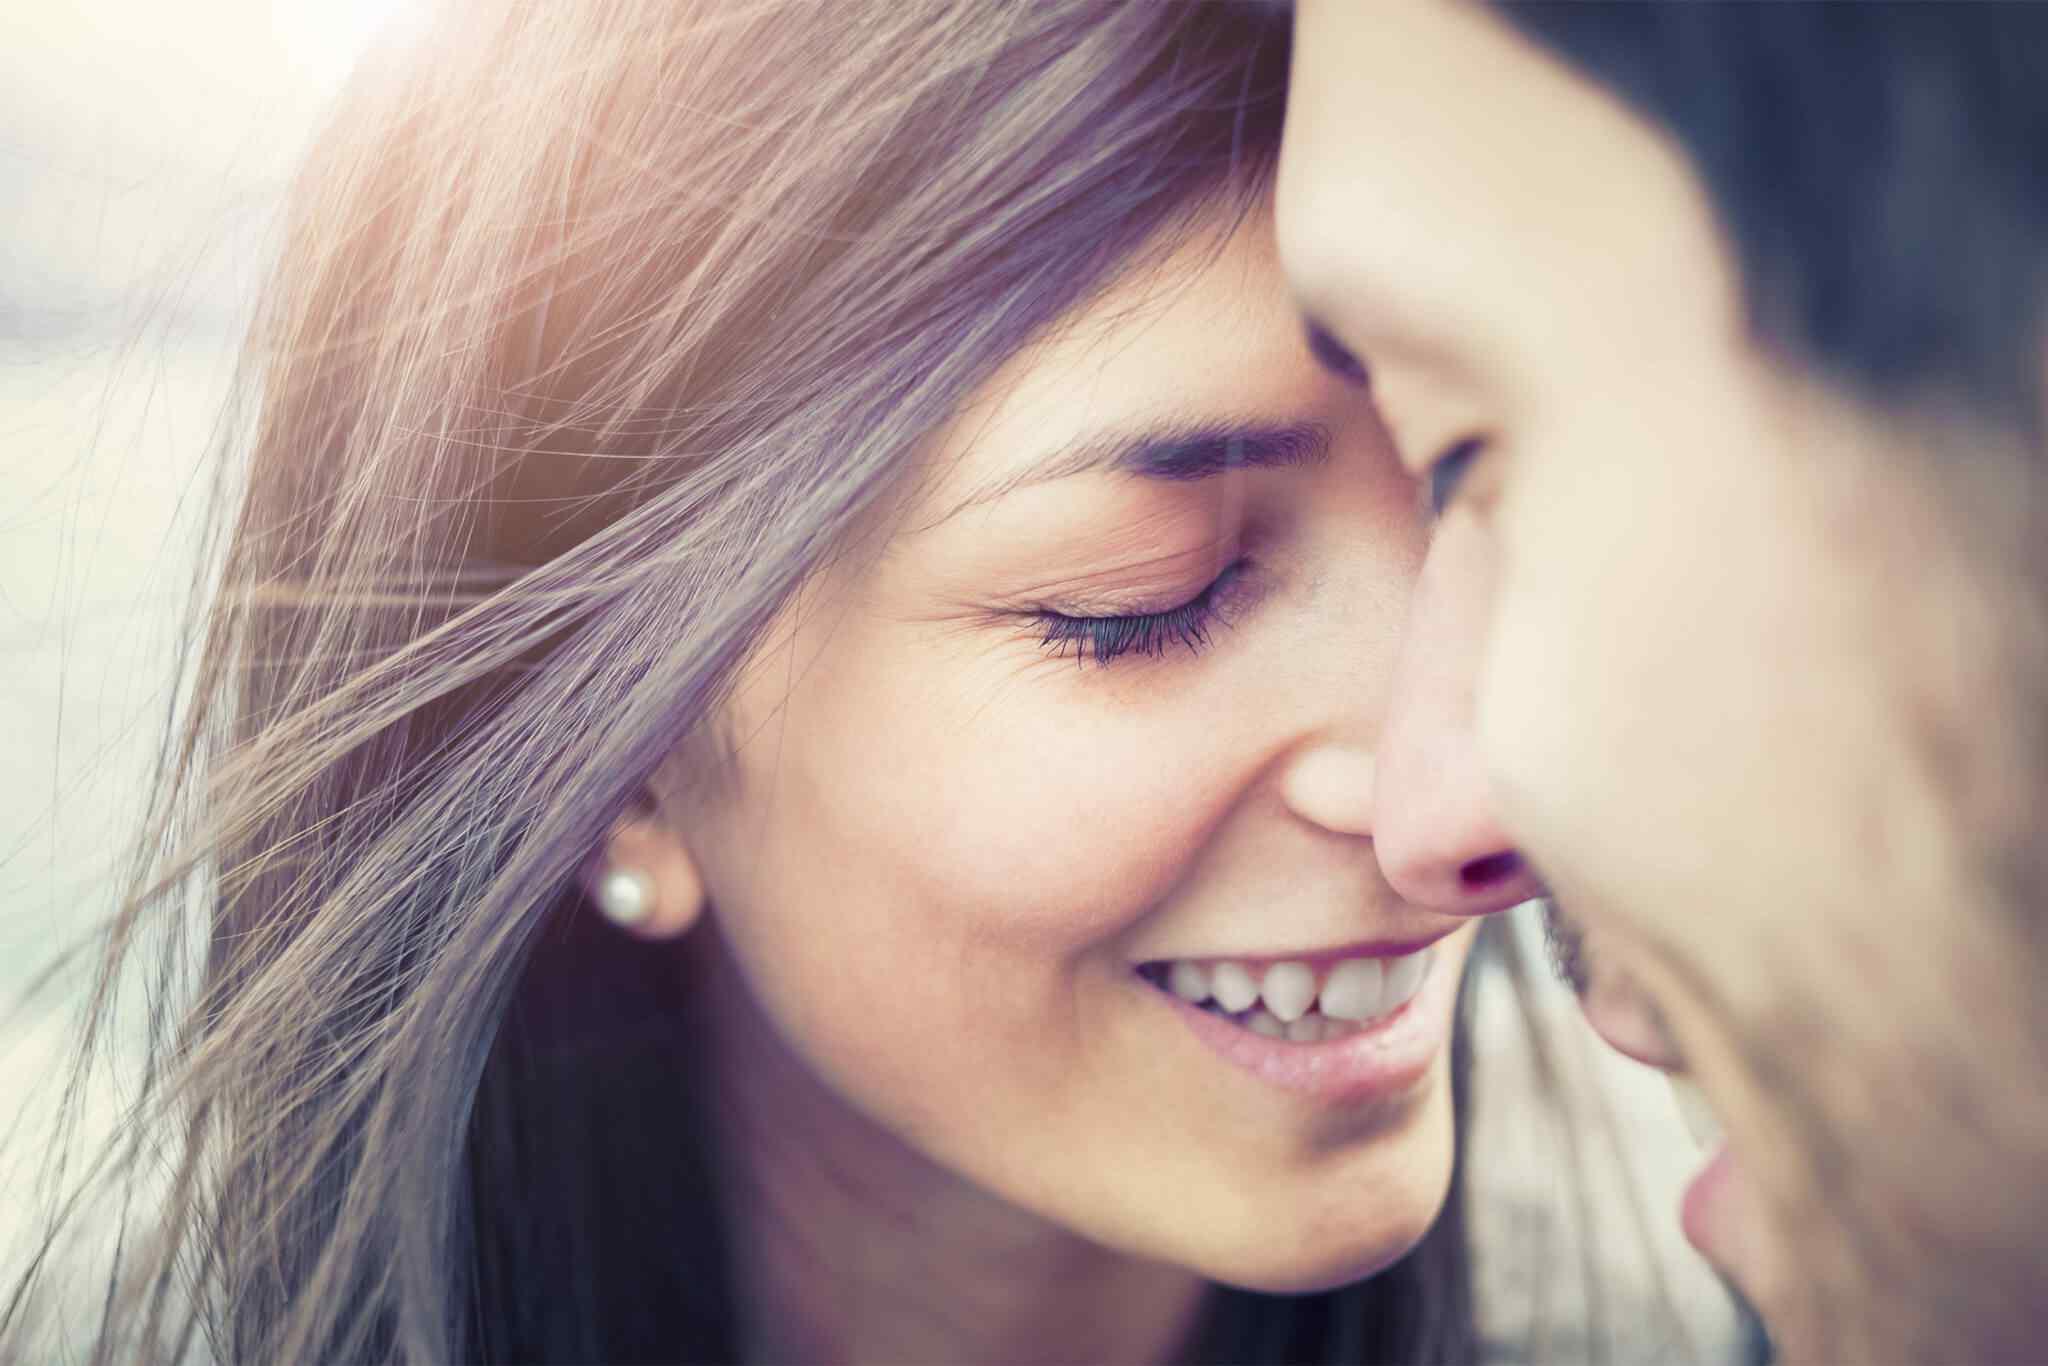 https://www.eryckdzotsi.com/wp-content/uploads/2018/01/img-class-marriage-01.jpg